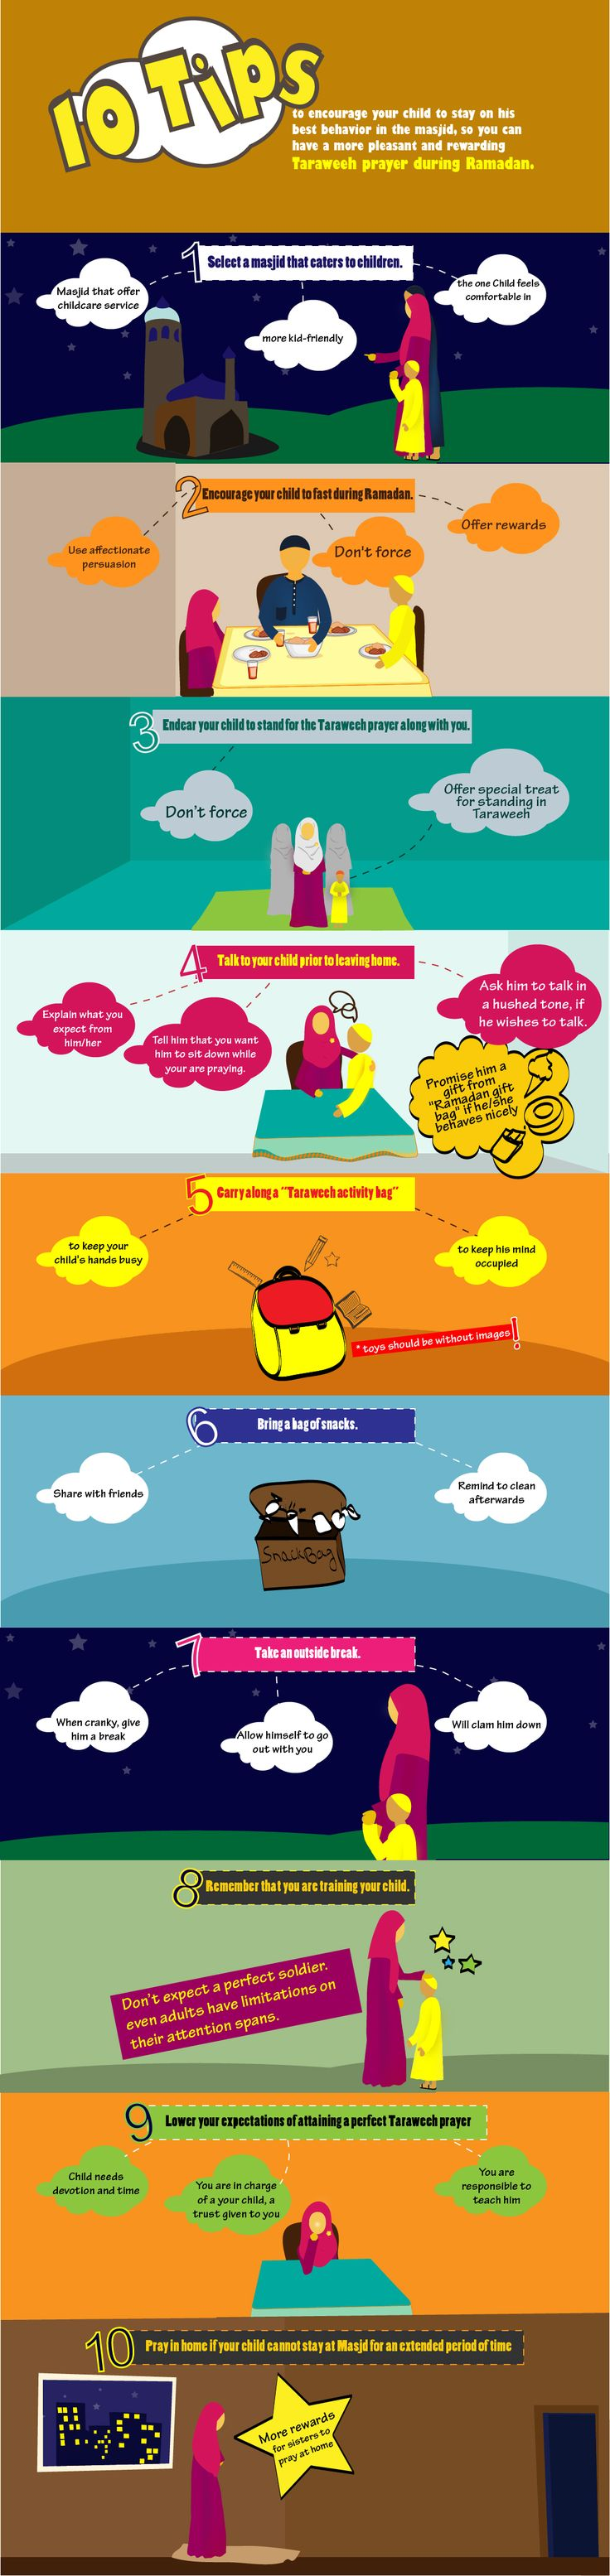 10 Tips to Child-Proof your Taraweeh this Ramadan